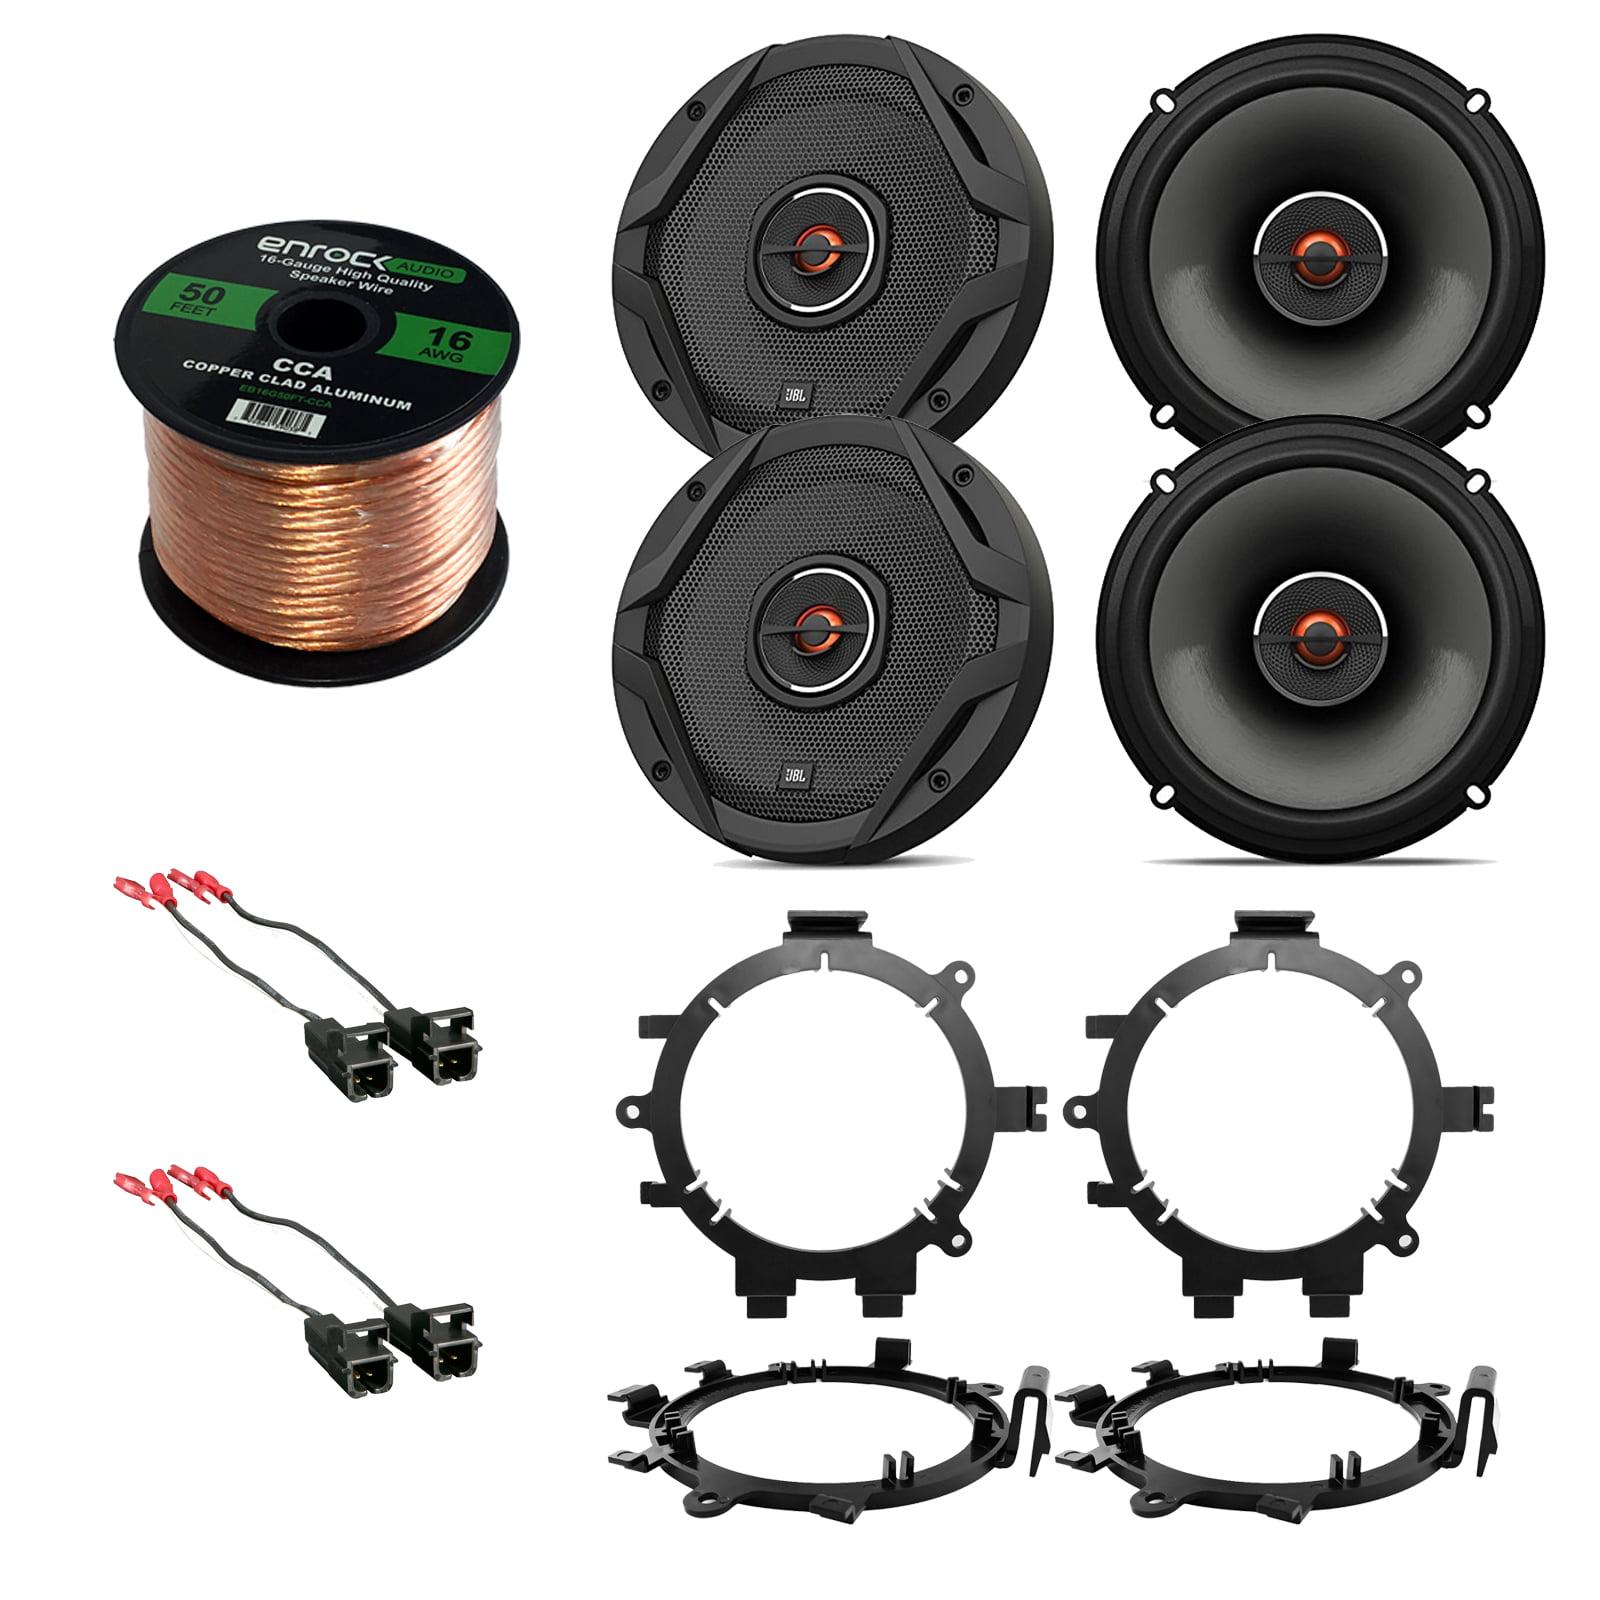 4x Jbl 65 2way Gx Series Coaxial Car Audio Speakers Bulk. 4x Jbl 65 2way Gx Series Coaxial Car Audio Speakers Bulk Packaging. Wiring. Car Stereo Wire Harness Gauge At Scoala.co